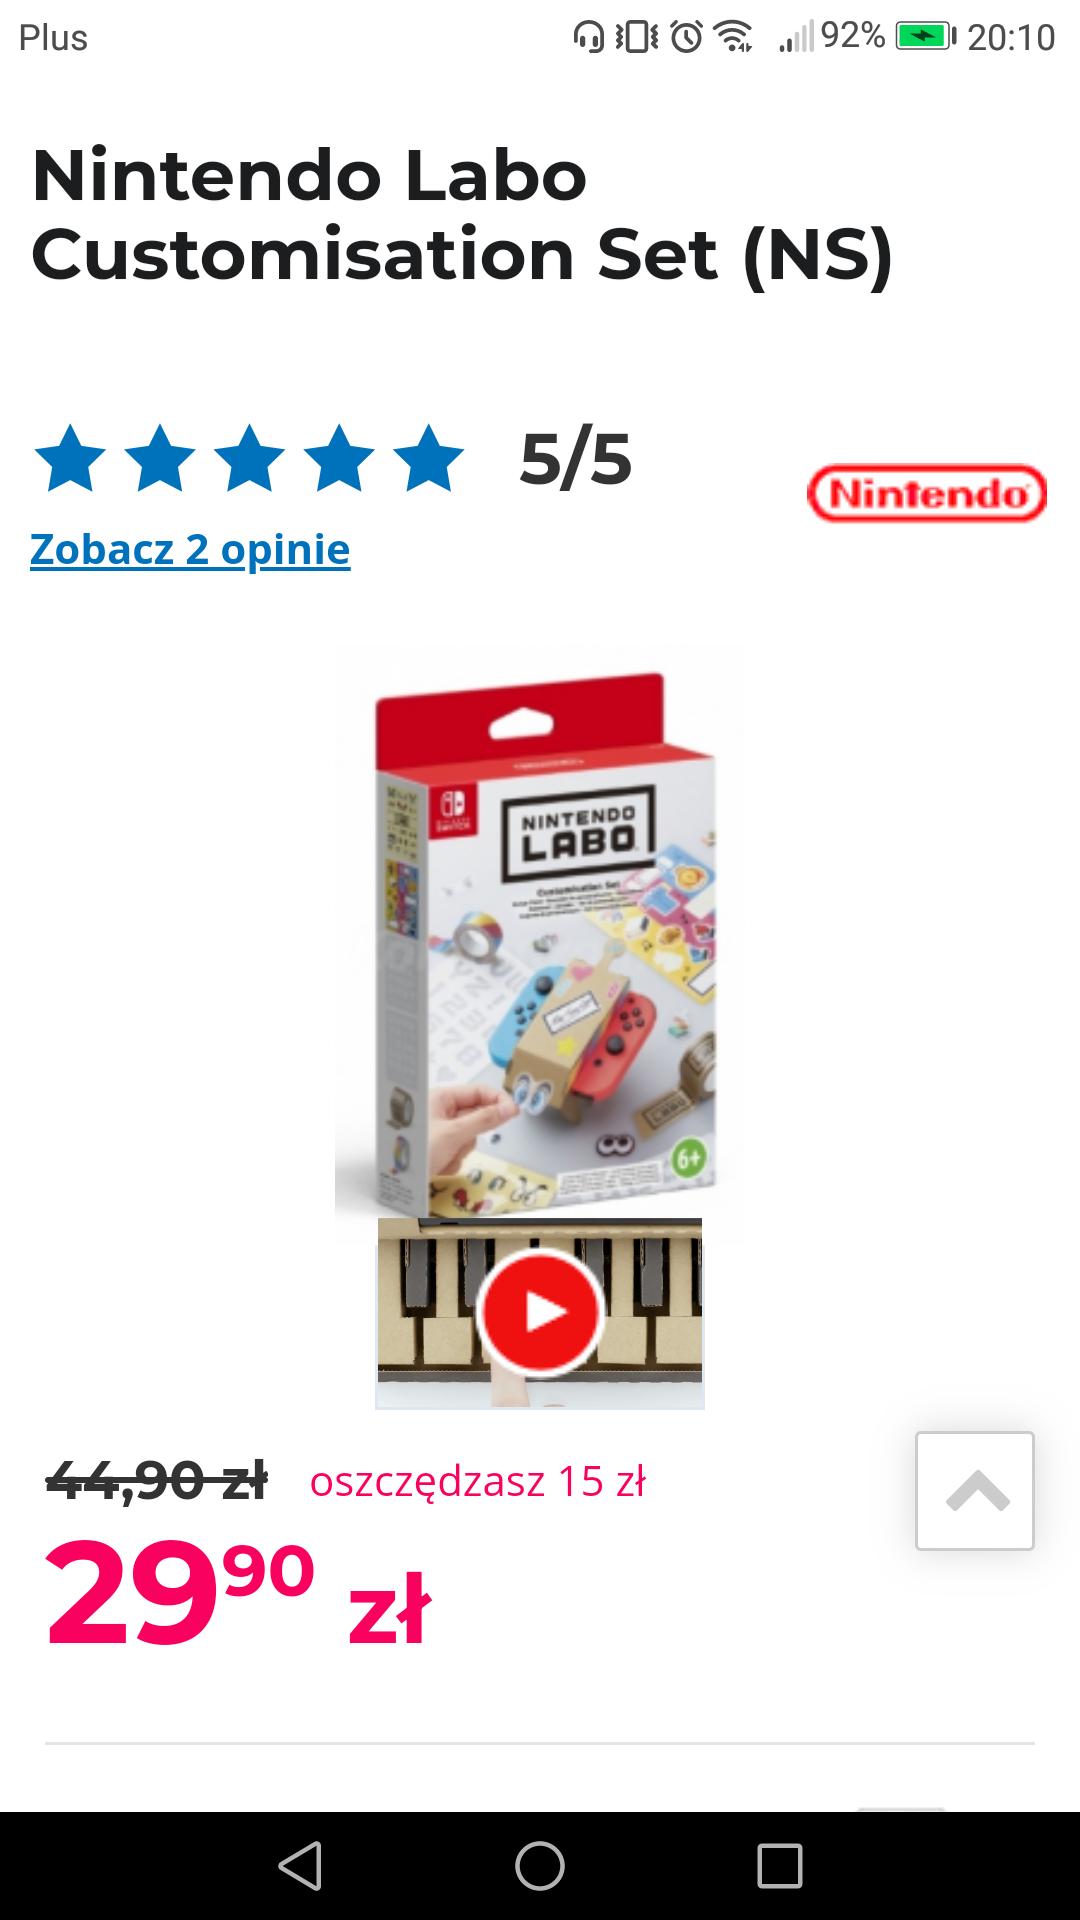 Nintendo Labo Customisation Set (NS)